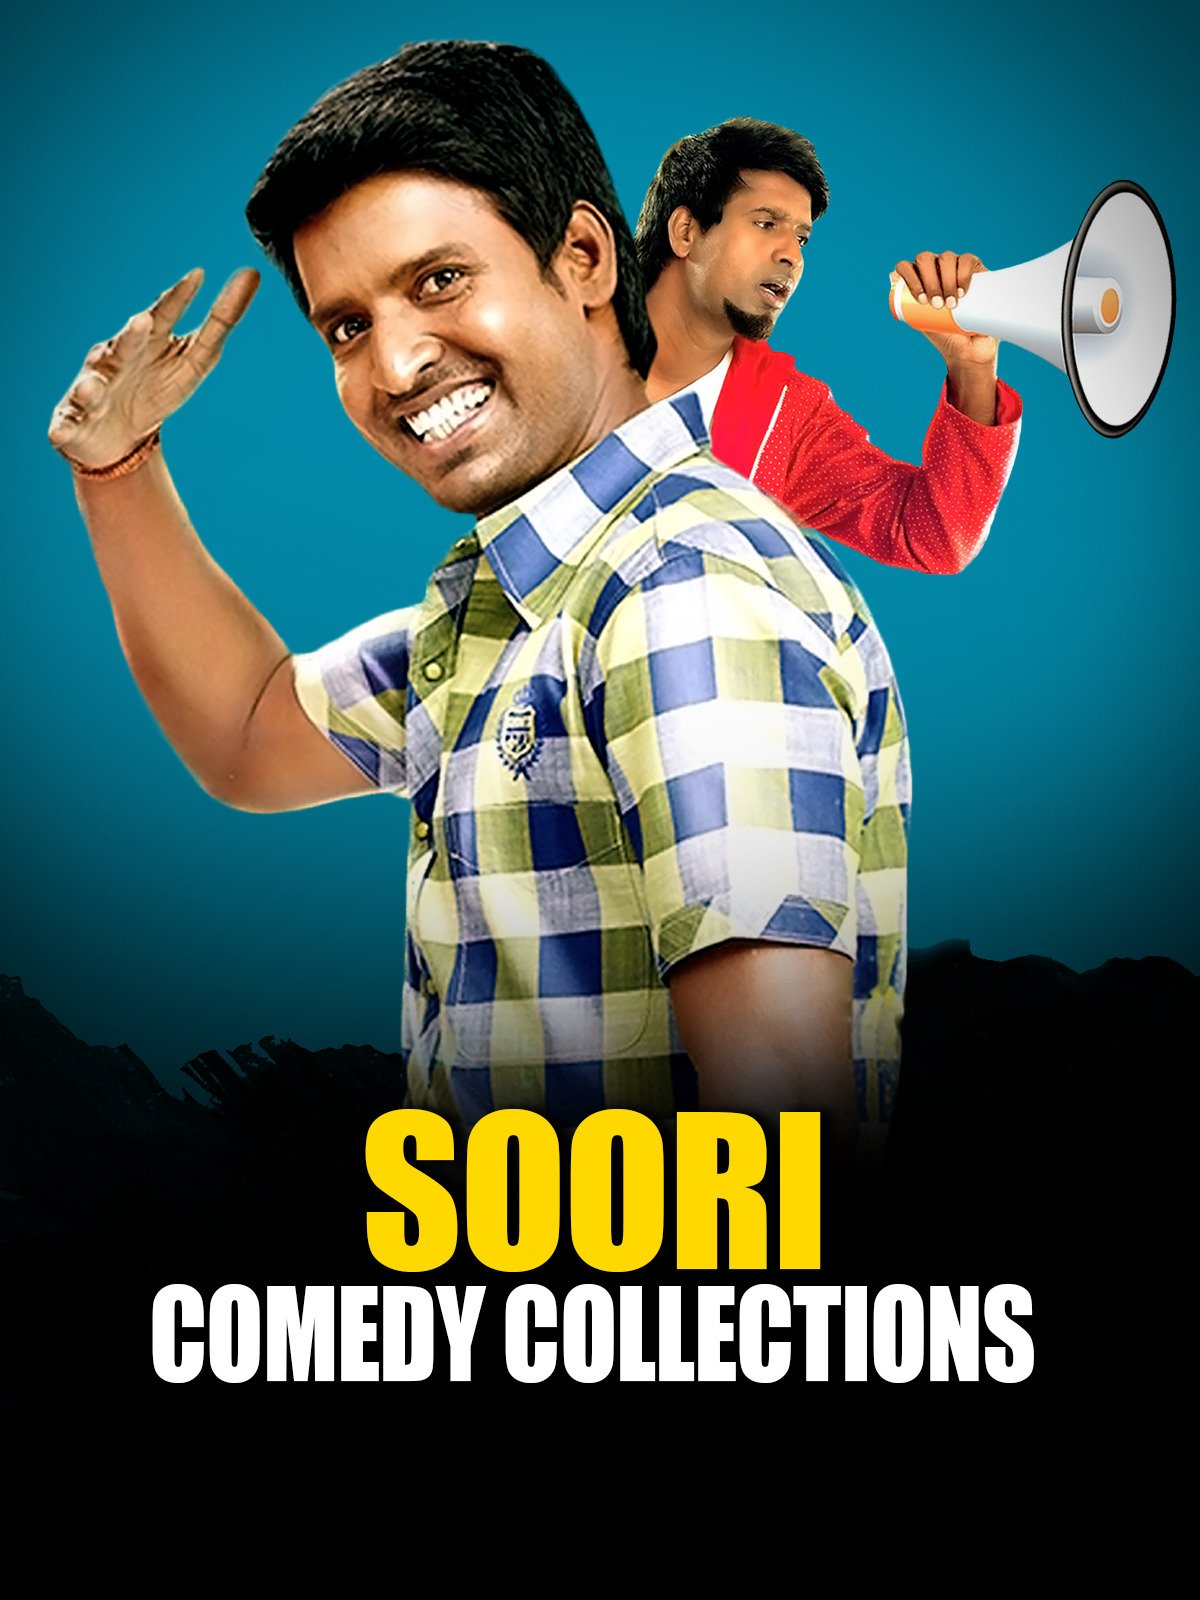 Clip: Soori Comedy Collections